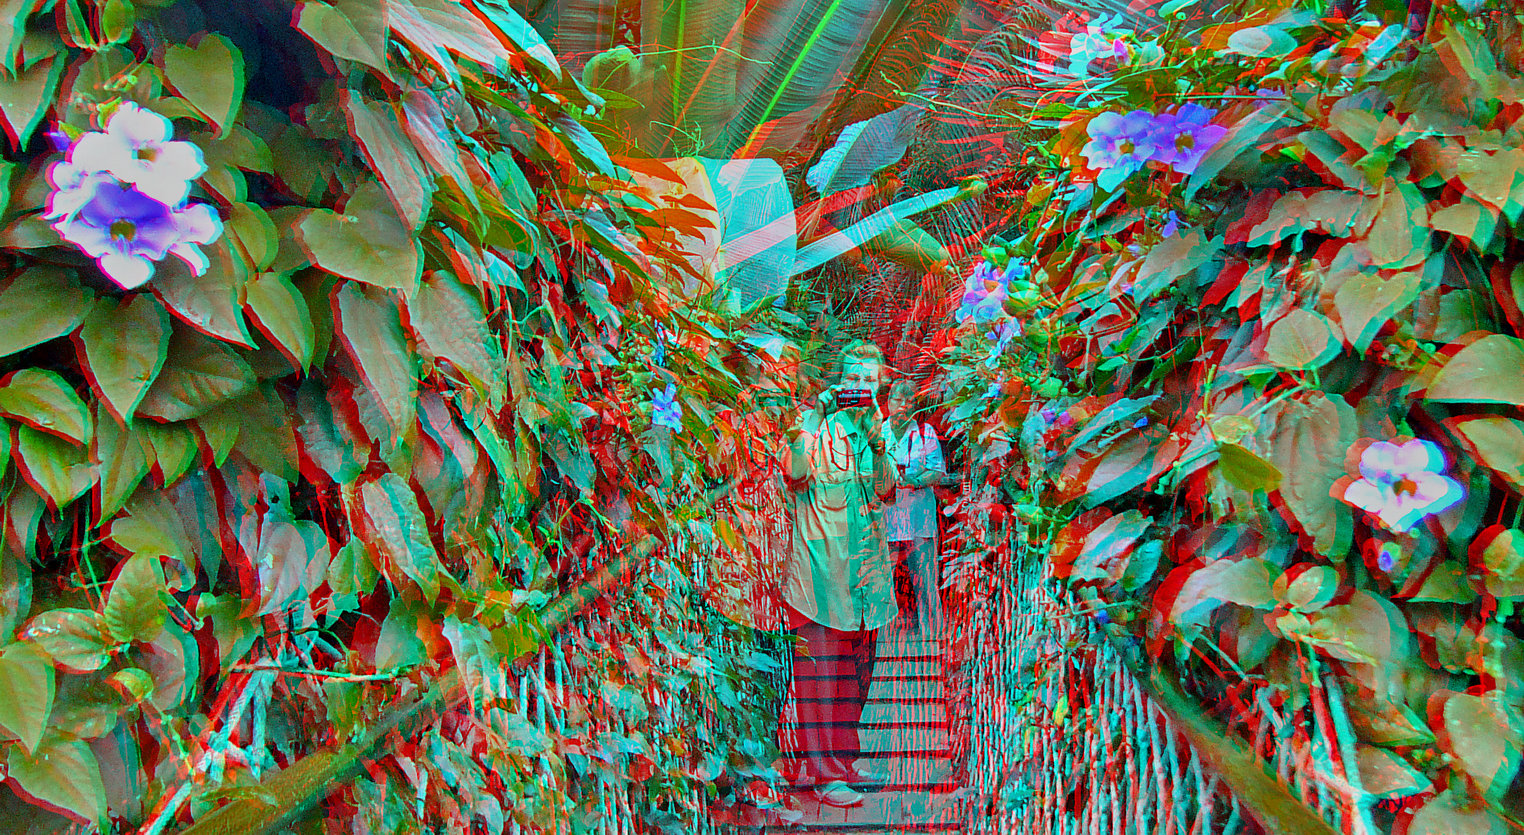 Fotosafari in 3D (01)